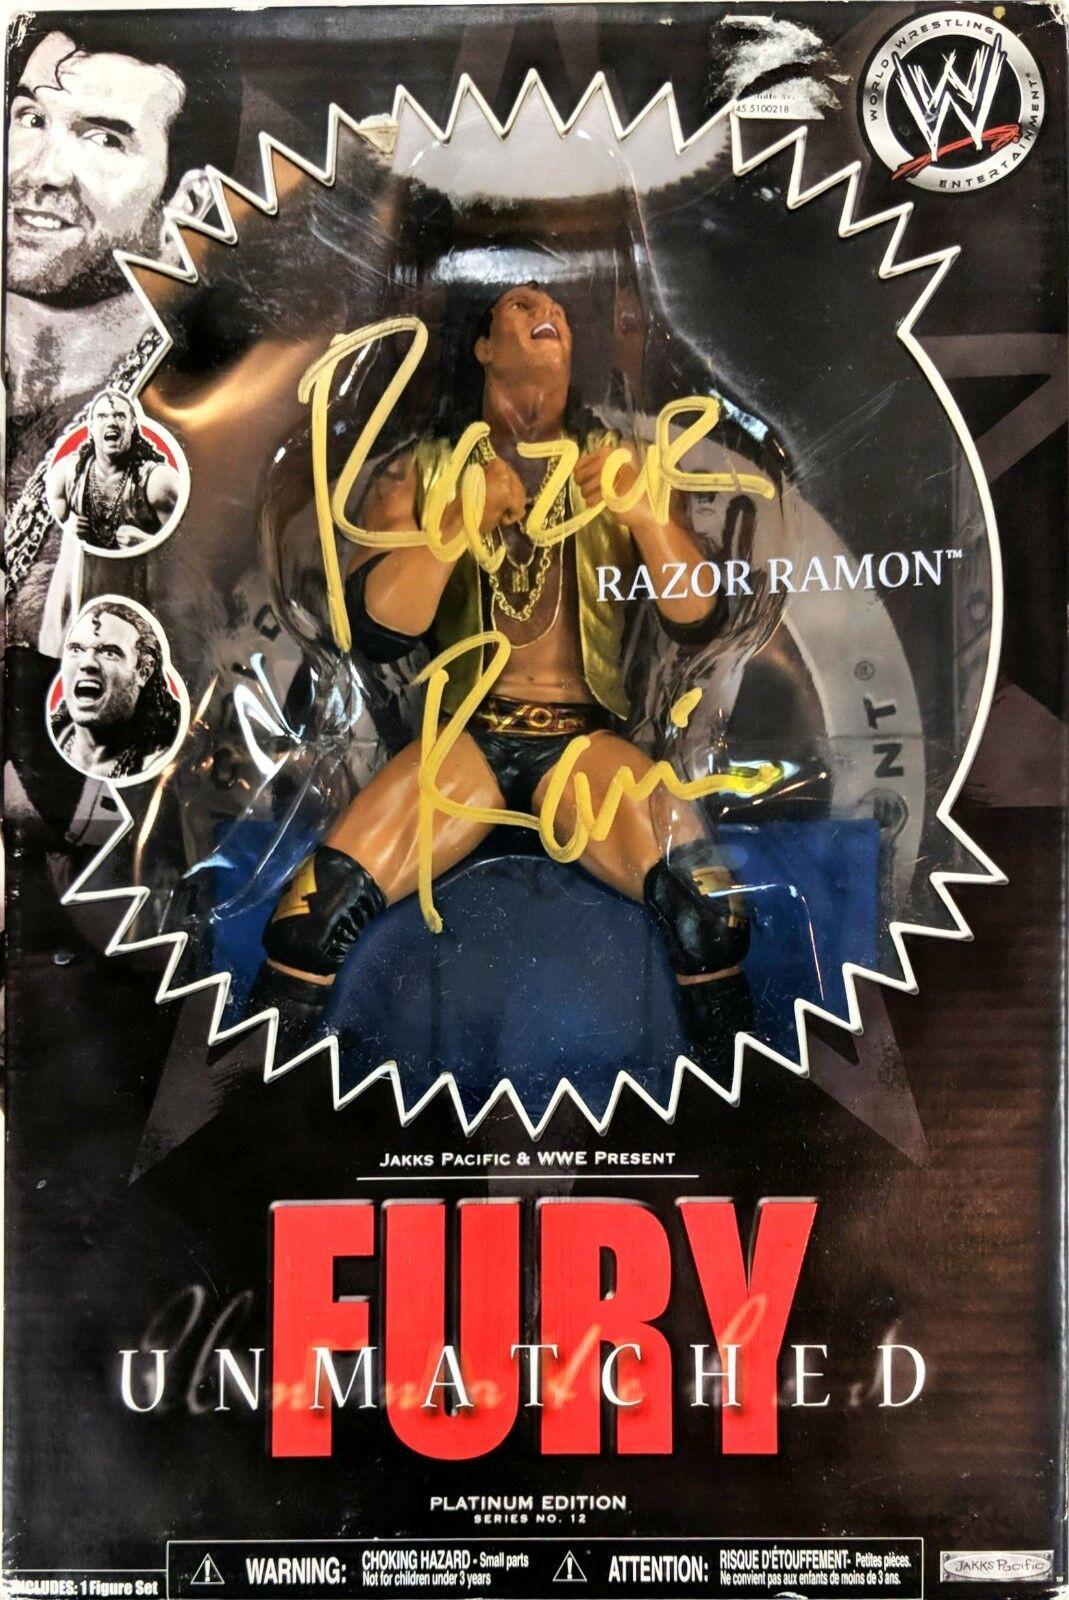 WWE Unmatched Fury Razor Ramon Platinum Series Signed Autograph Sealed